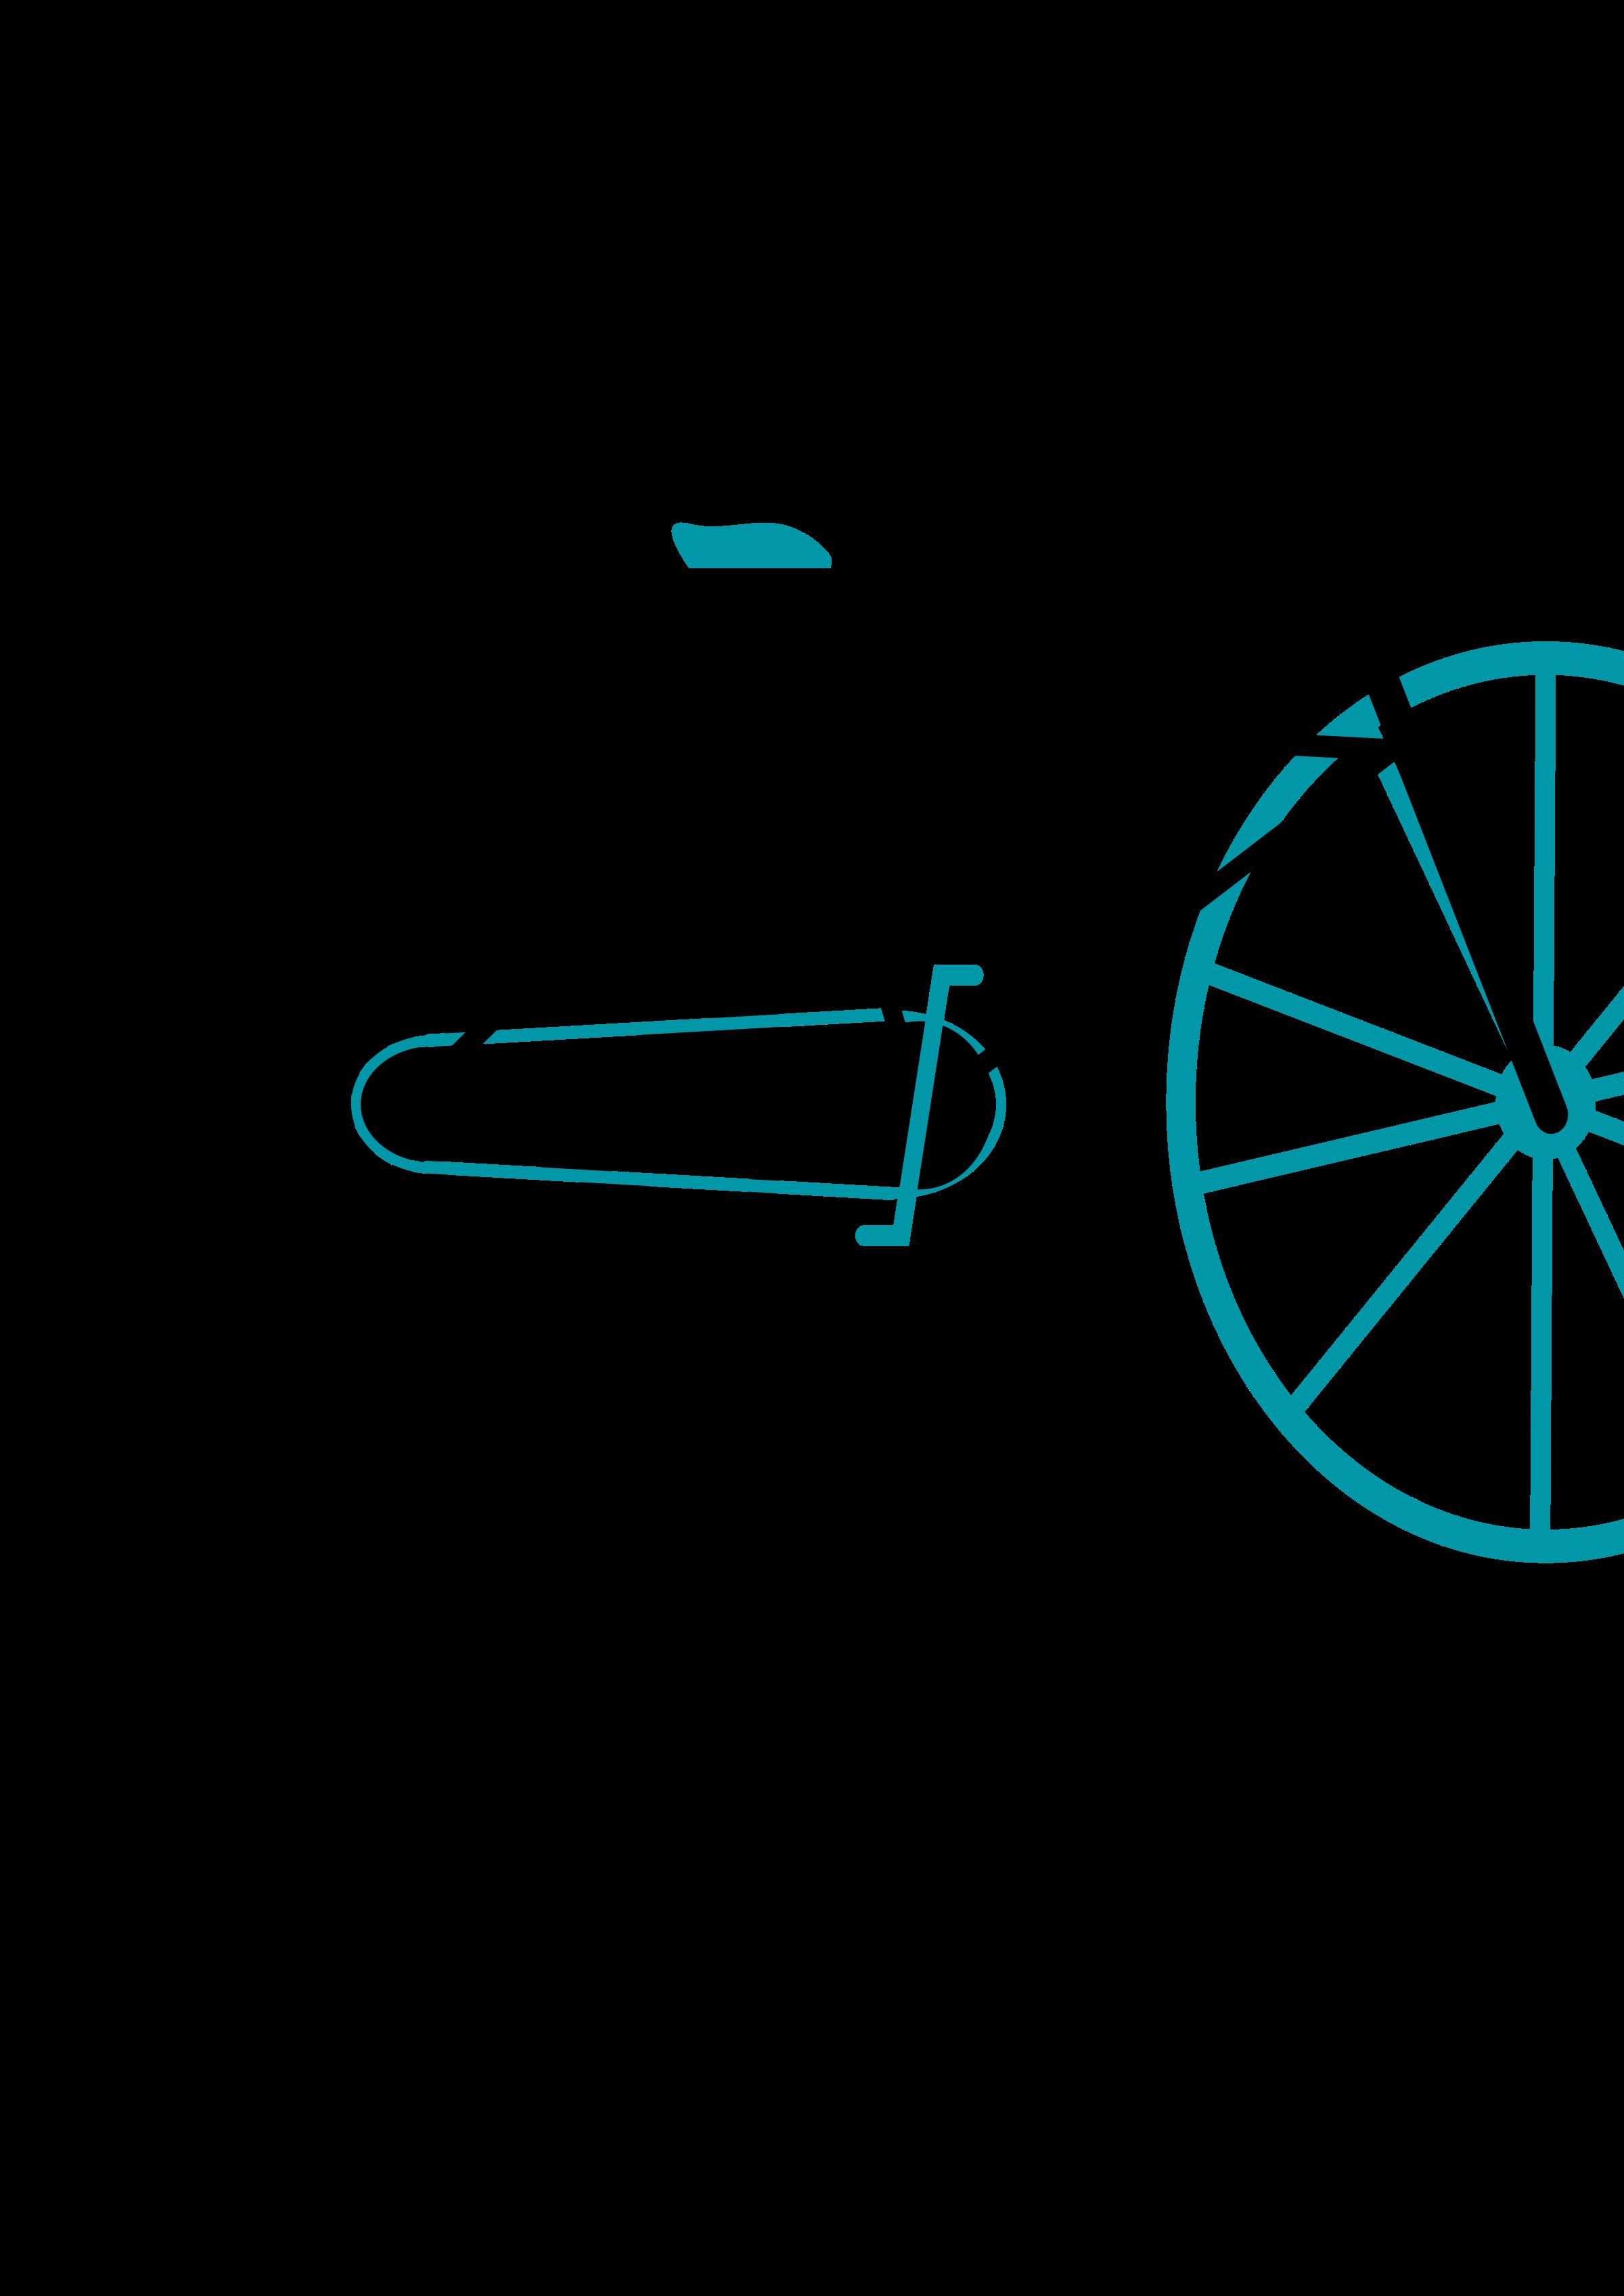 Gear clipart bike gear. Fixed big image png